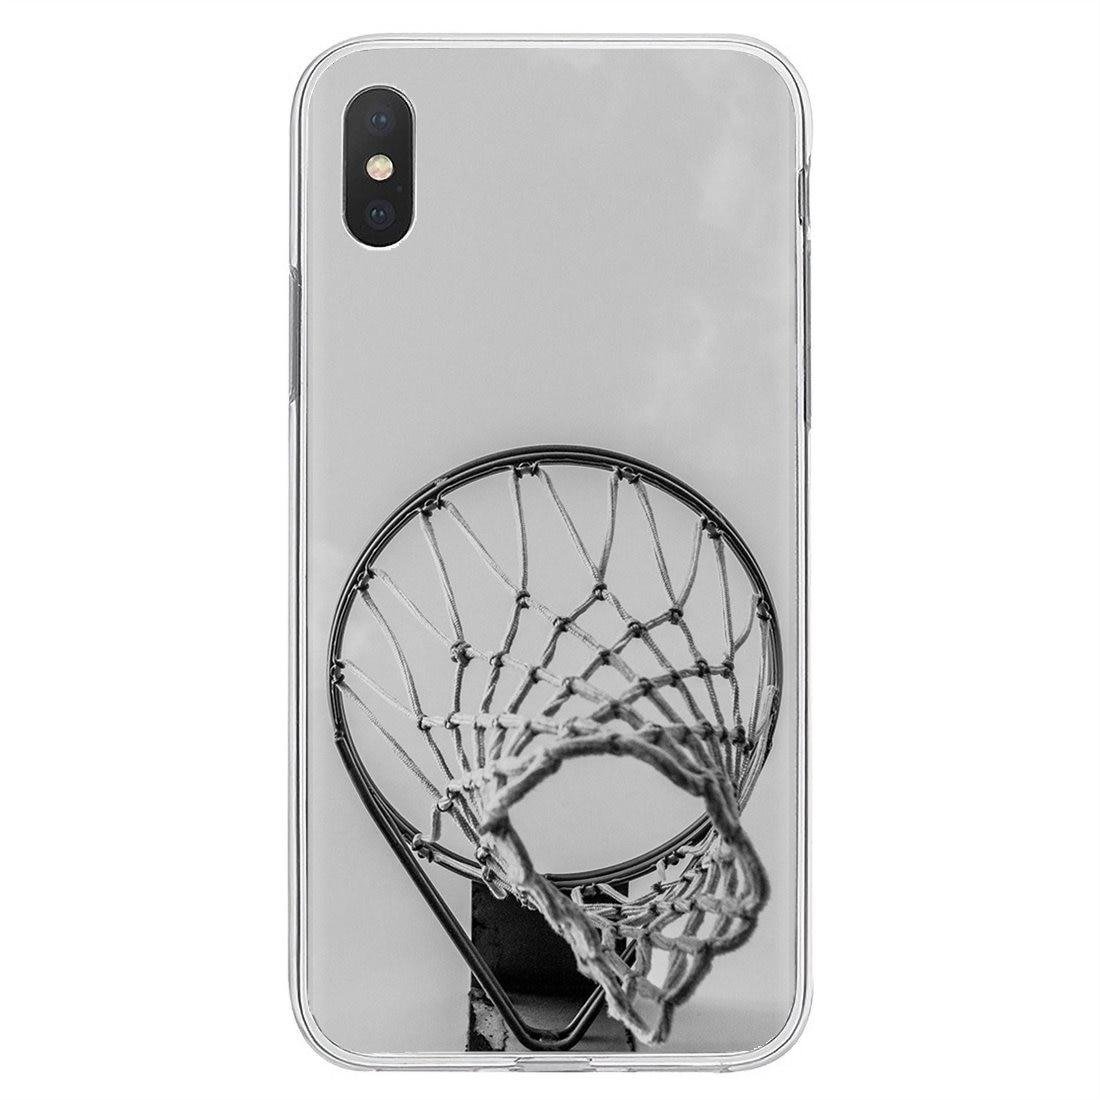 Funda de teléfono de silicona personalizada de baloncesto Space Dunk fire para Huawei G7 G8 P7 P8 P9 P10 P20 P30 Lite Mini Pro P Smart 2017 2018 2019